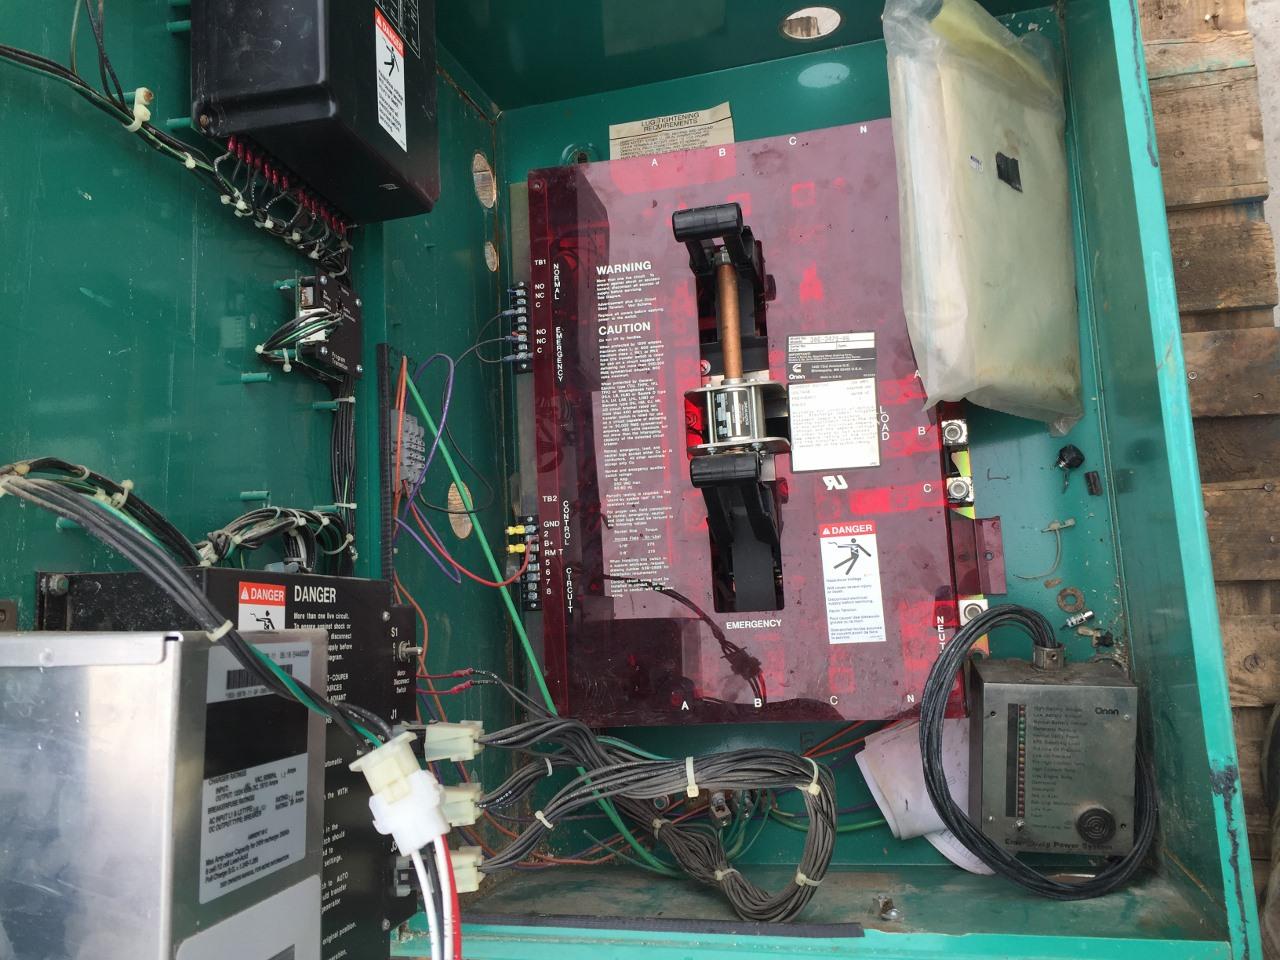 1994 cummins onan automatic transfer switch 150 amp, 480 volts